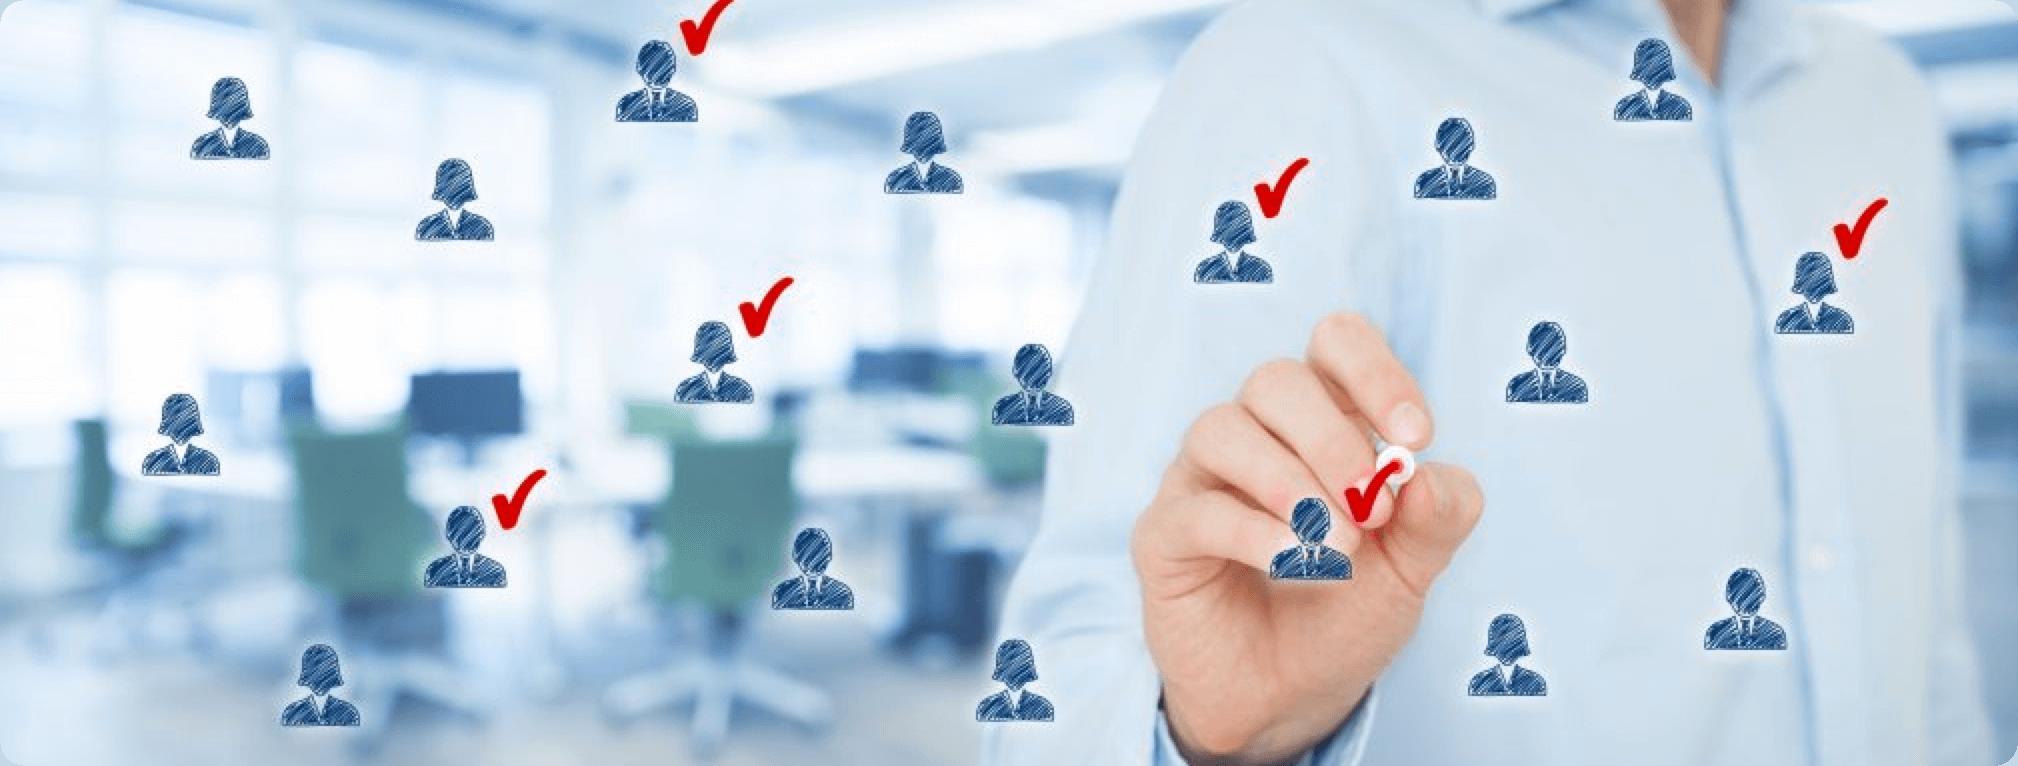 Best Market Research Software - Key ingredients of what makes a good market research software.